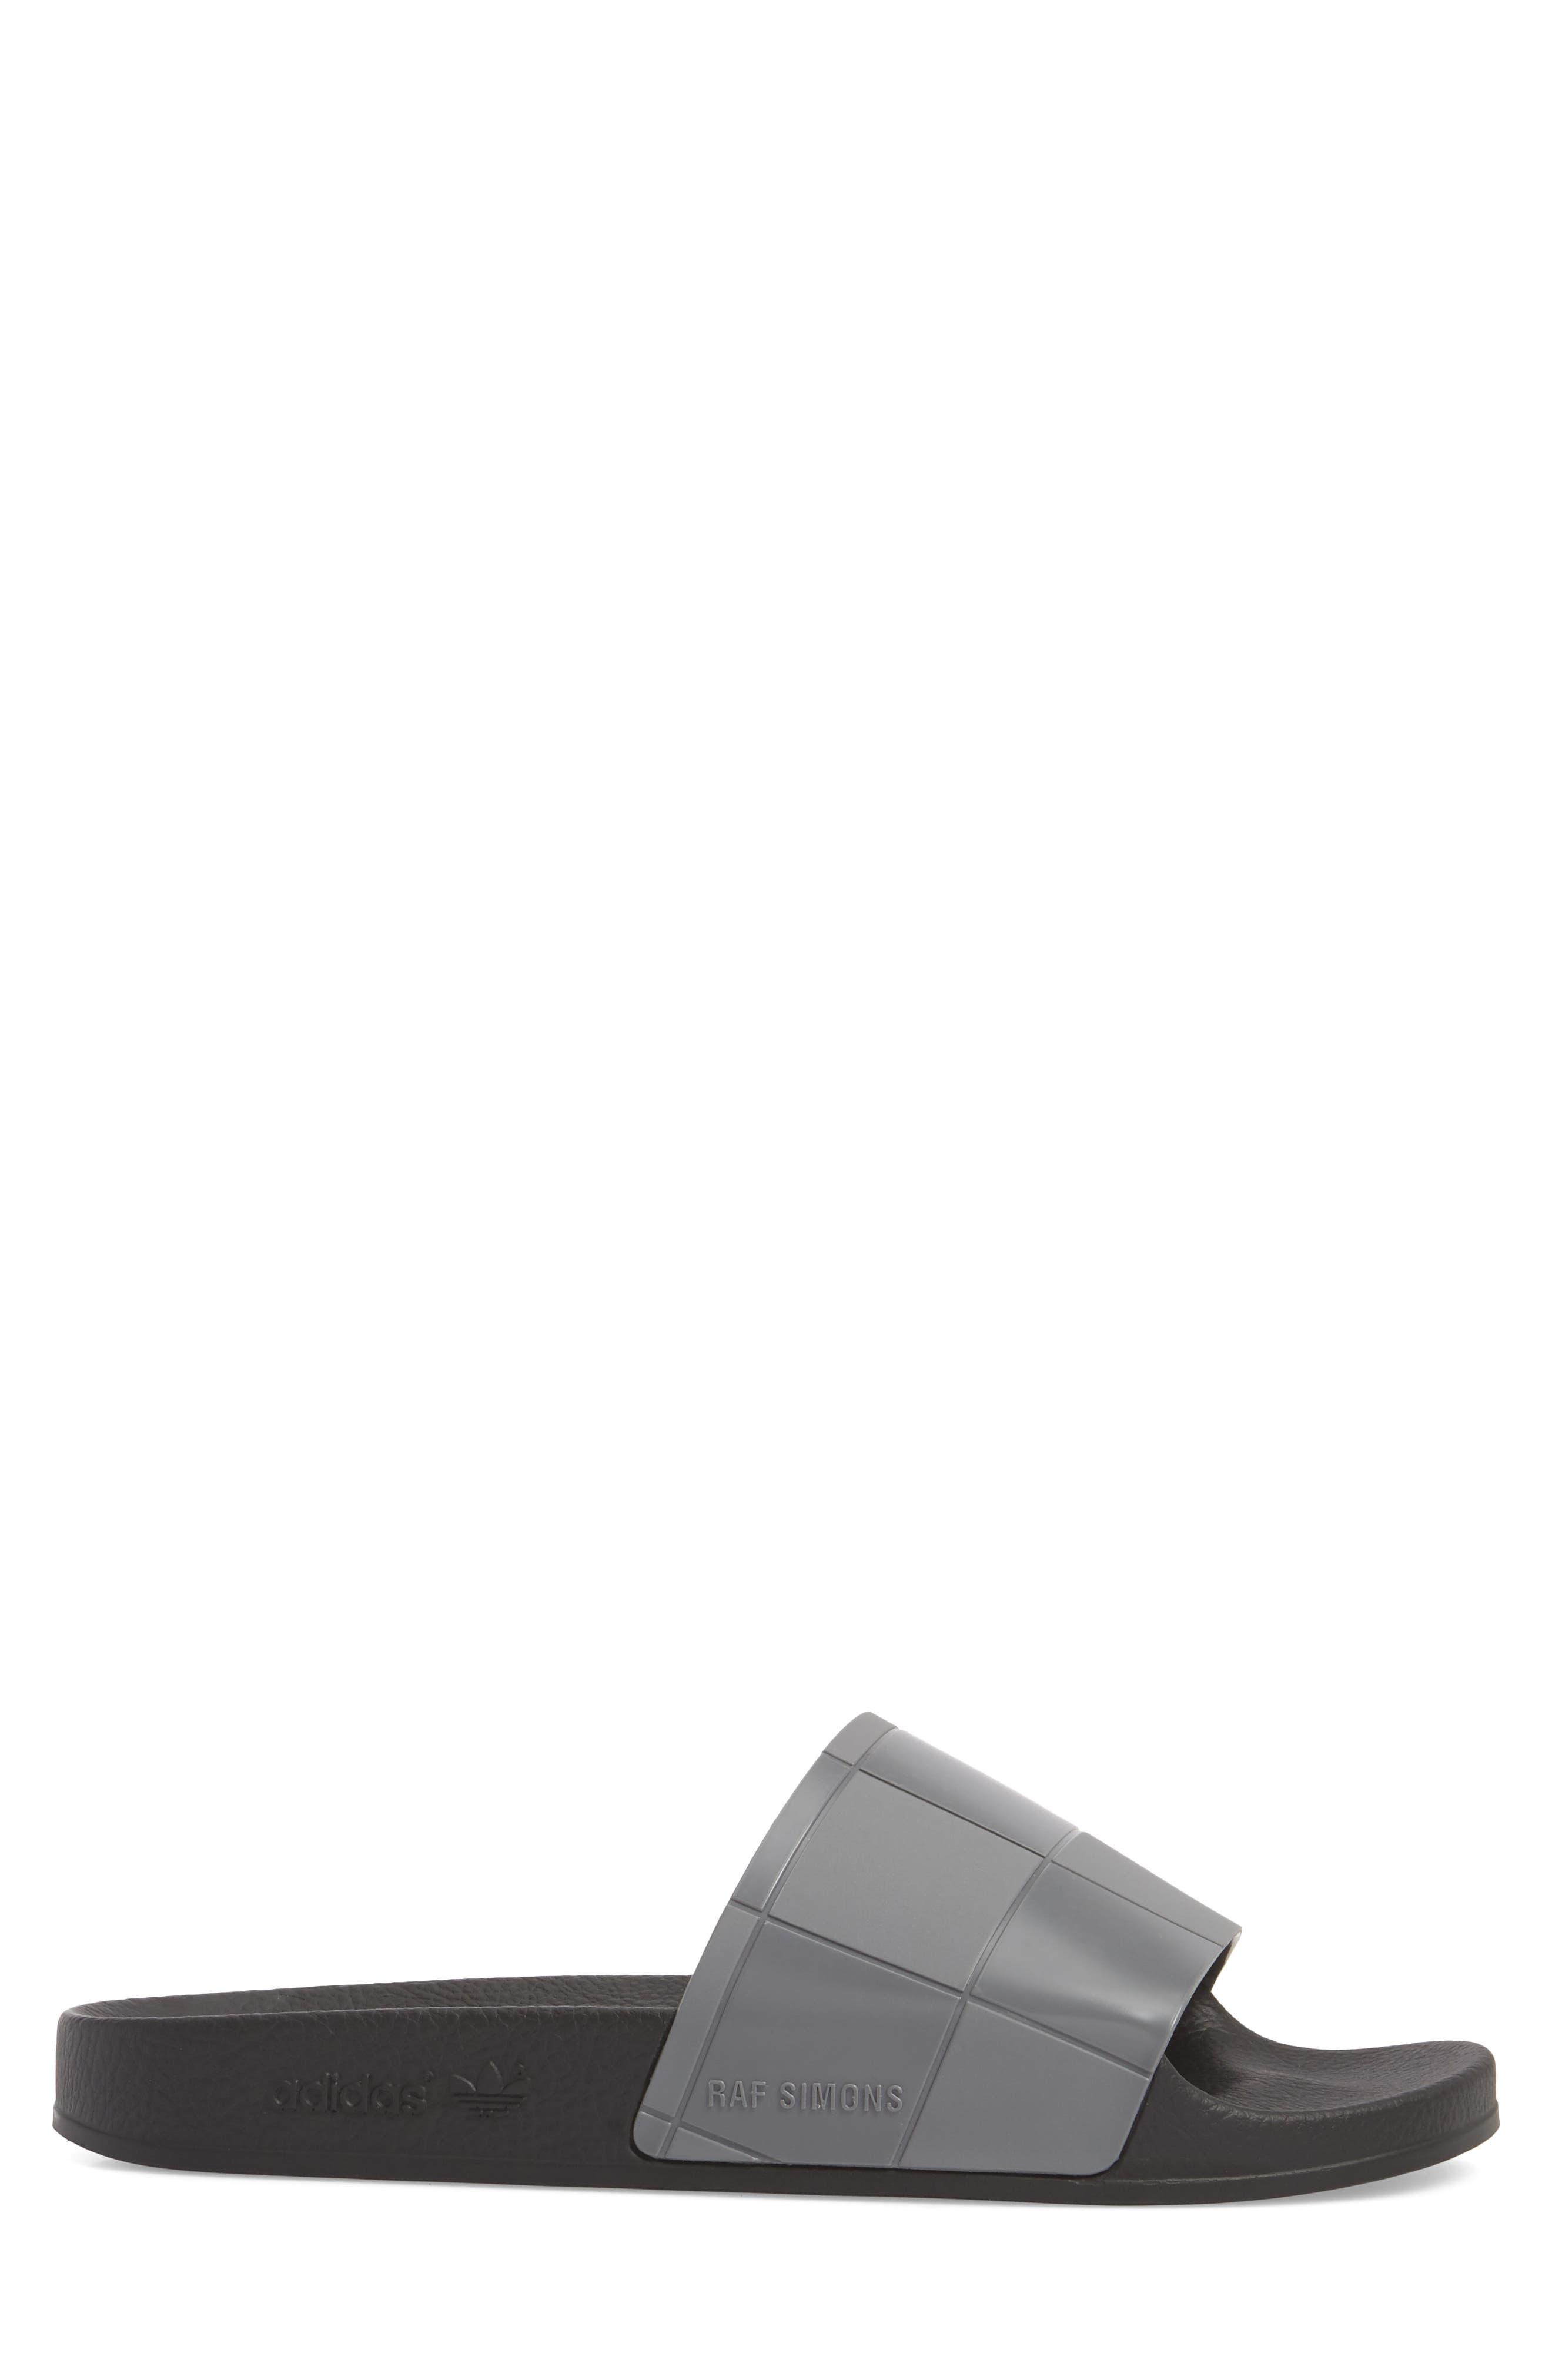 Adilette Checkerboard Sport Slide,                             Alternate thumbnail 3, color,                             Core Black/ Granite